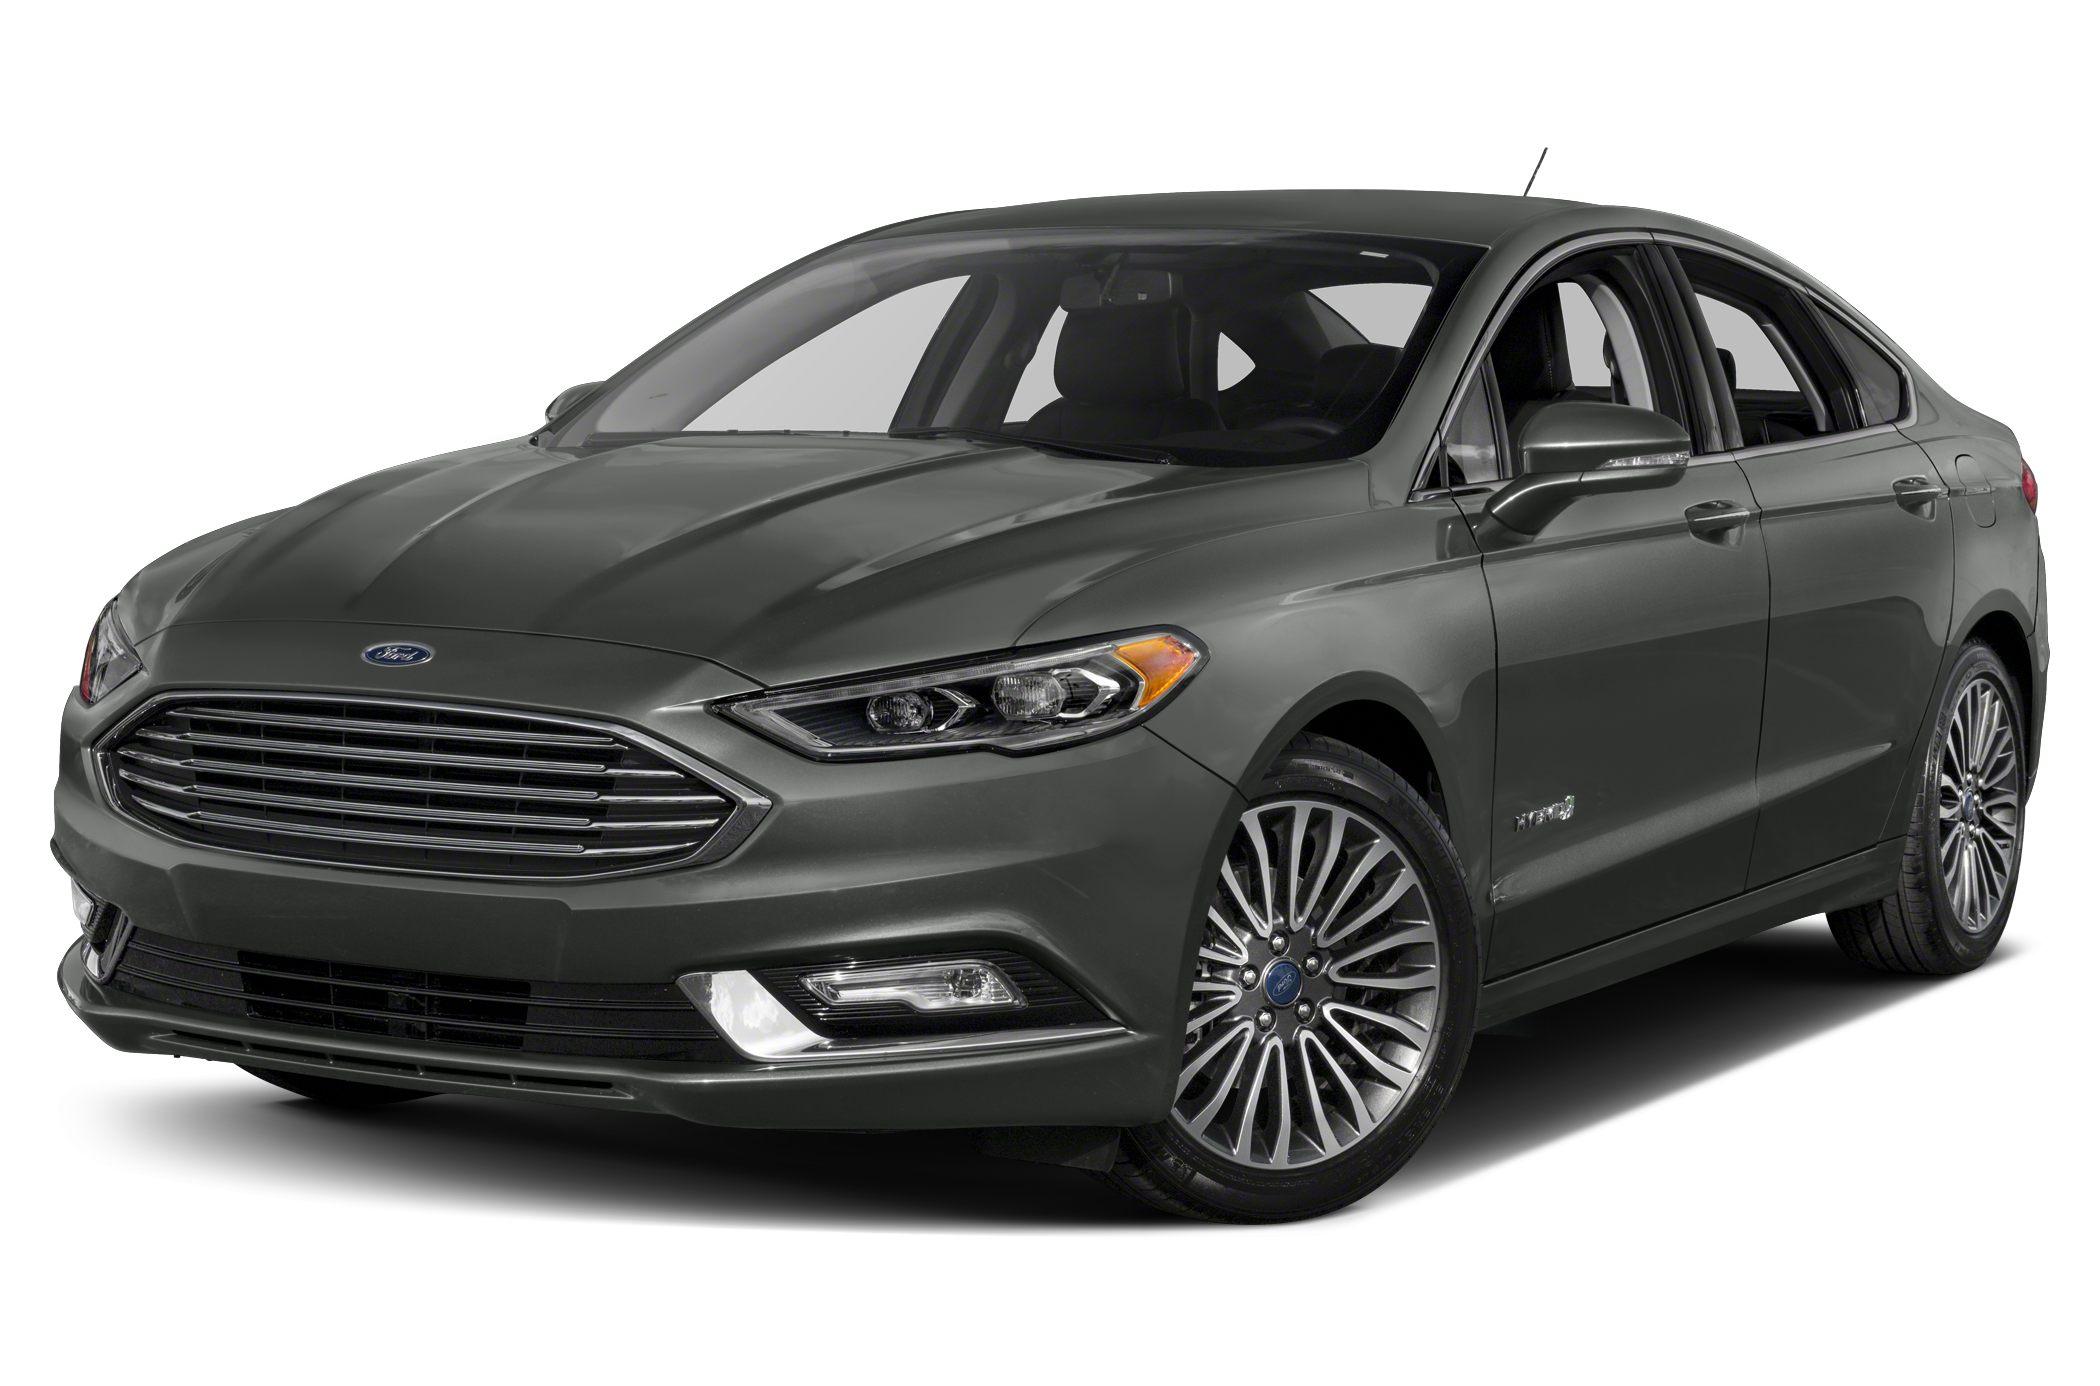 2018 Ford Fusion Hybrid Anium 4dr